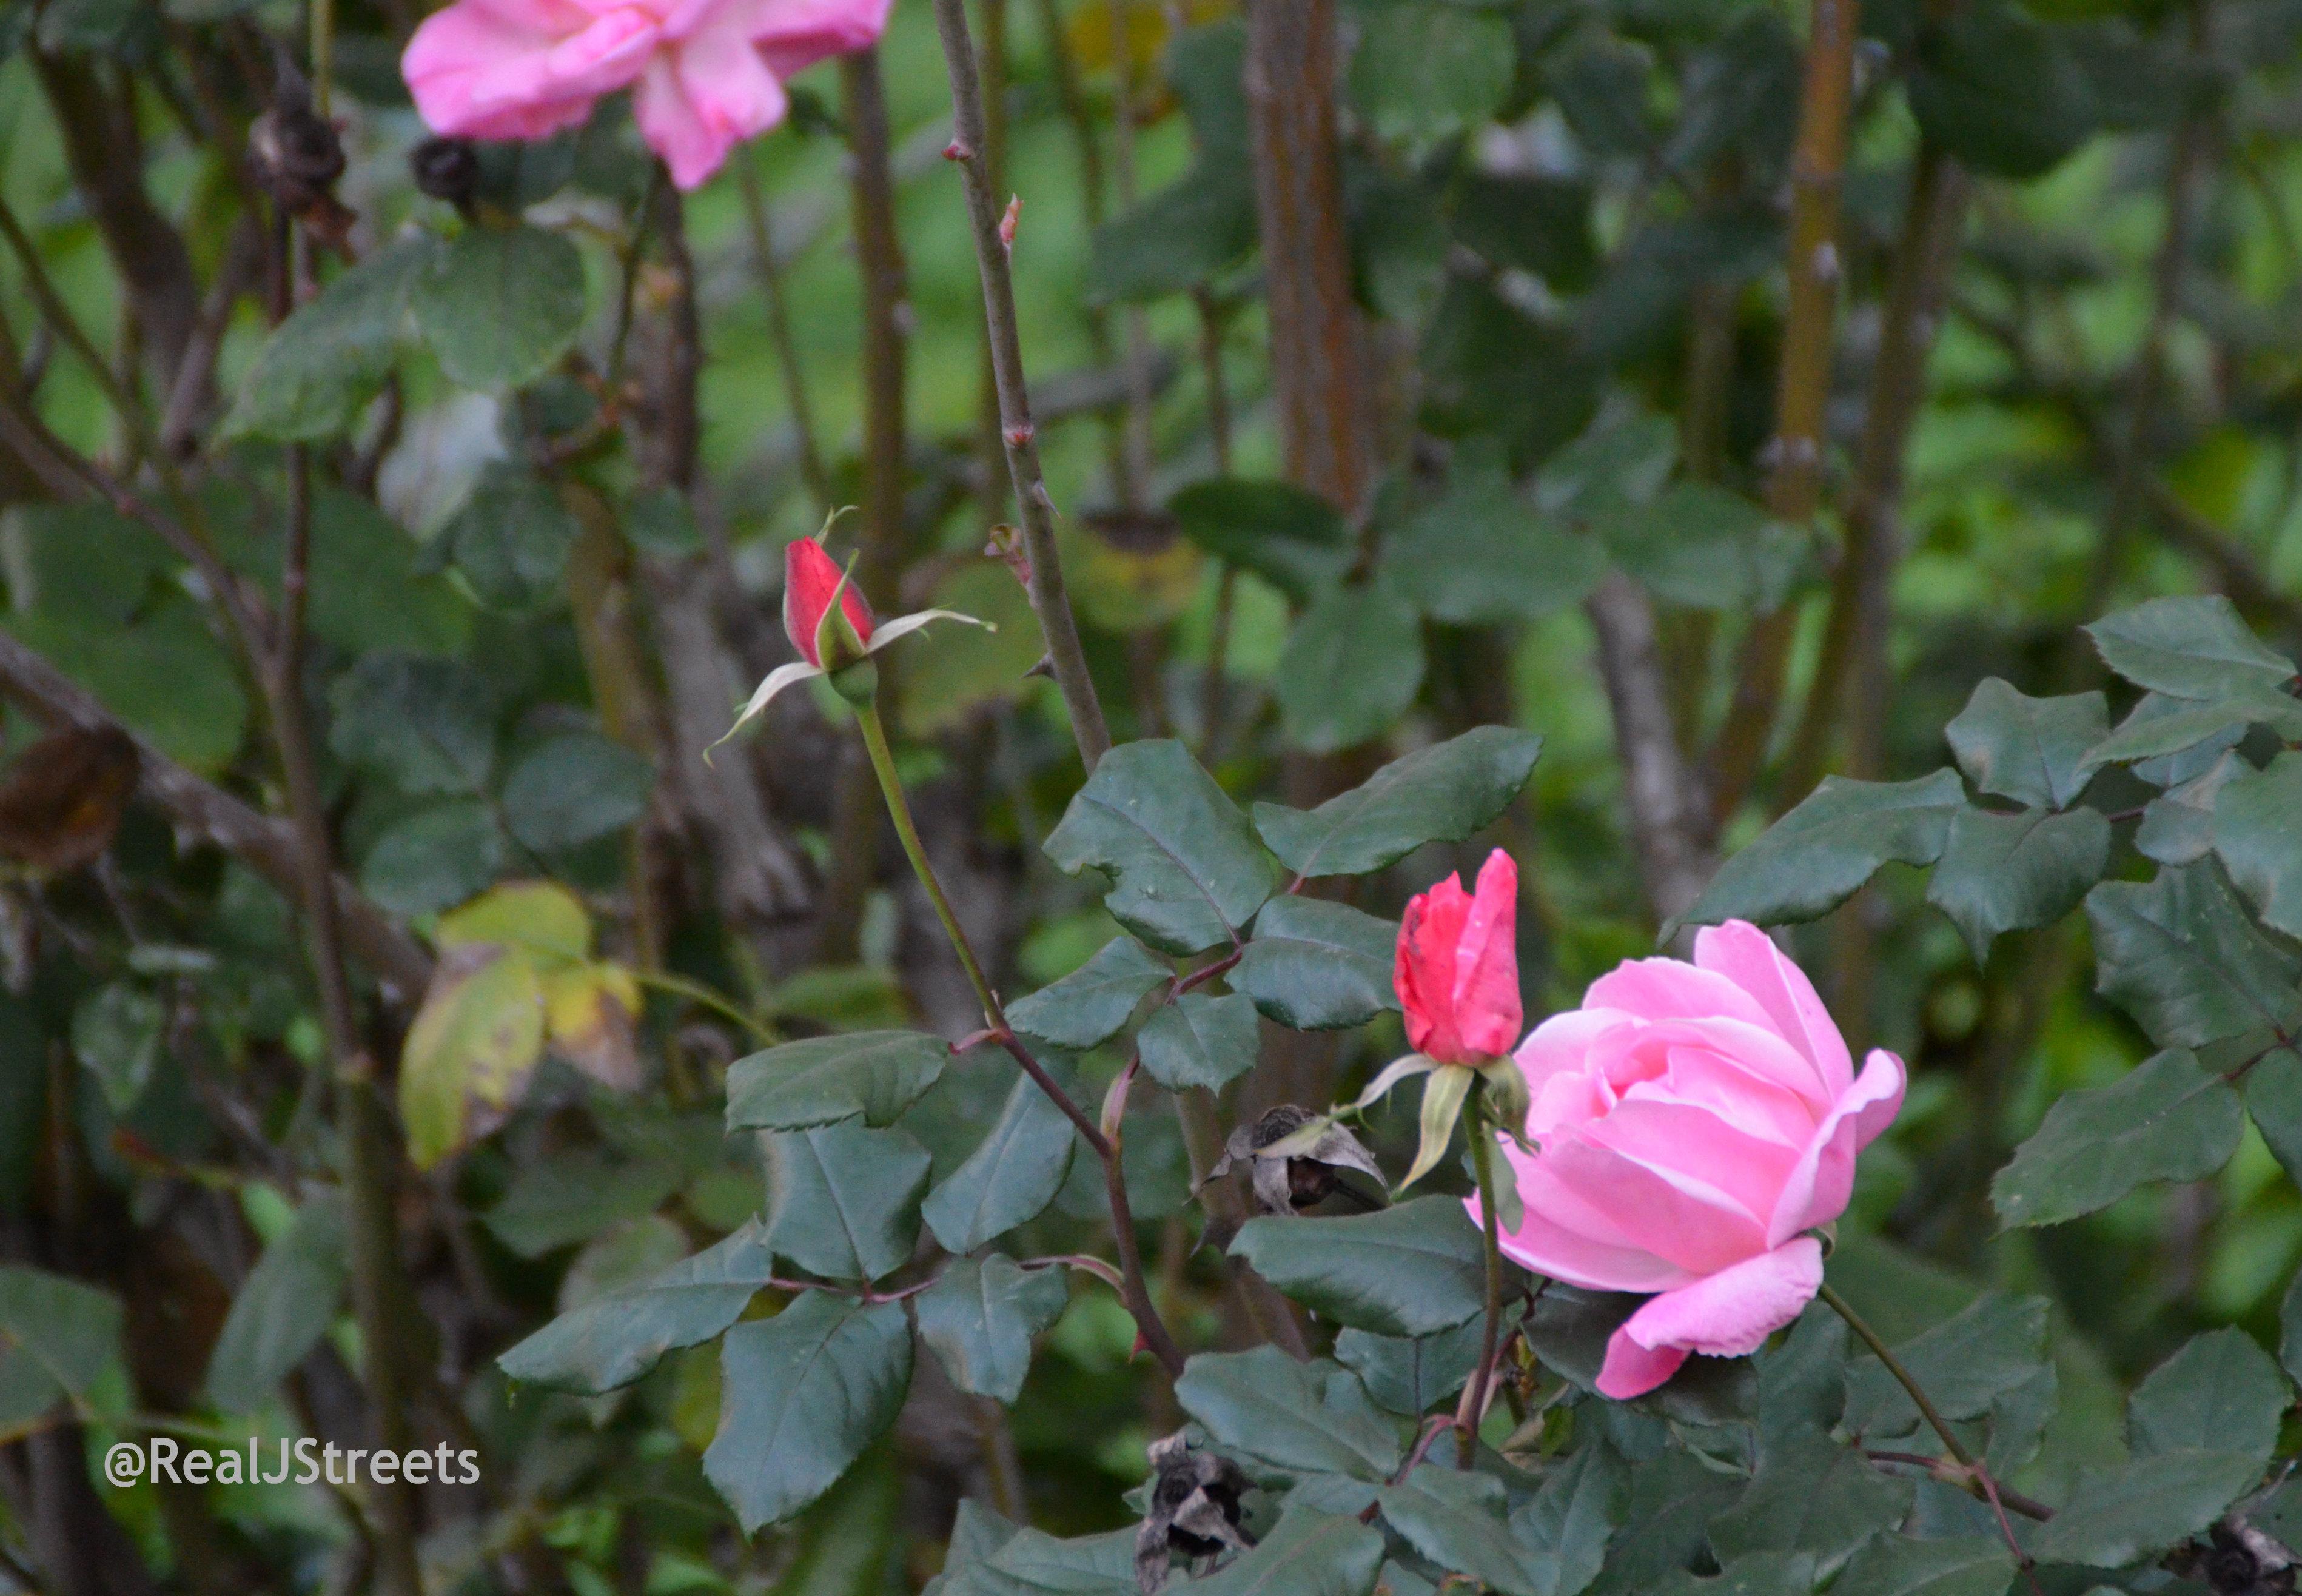 image December roses budding